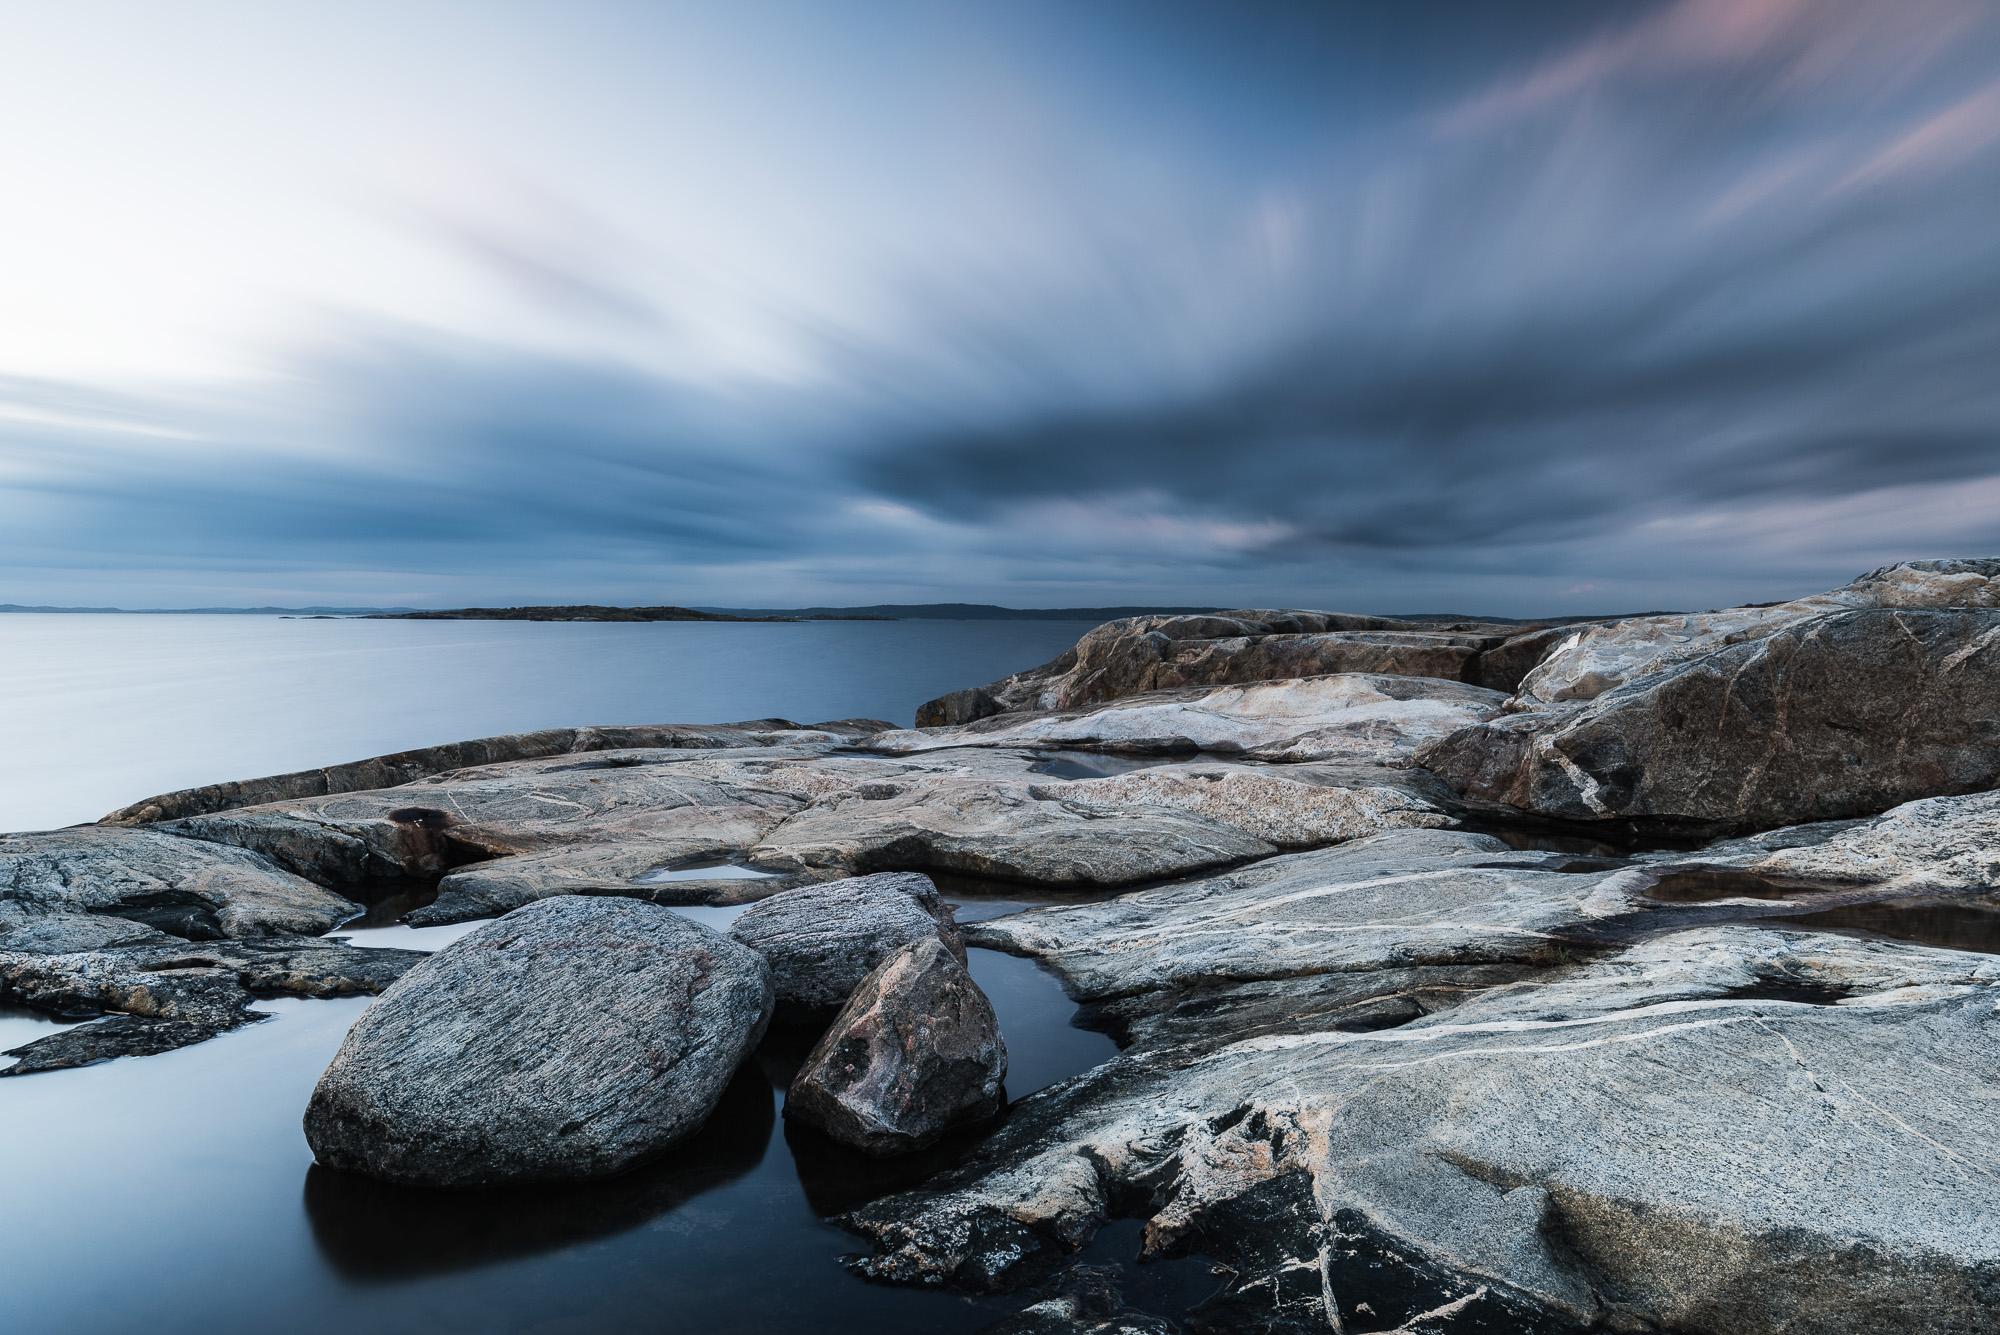 Sillvik, Hisingen